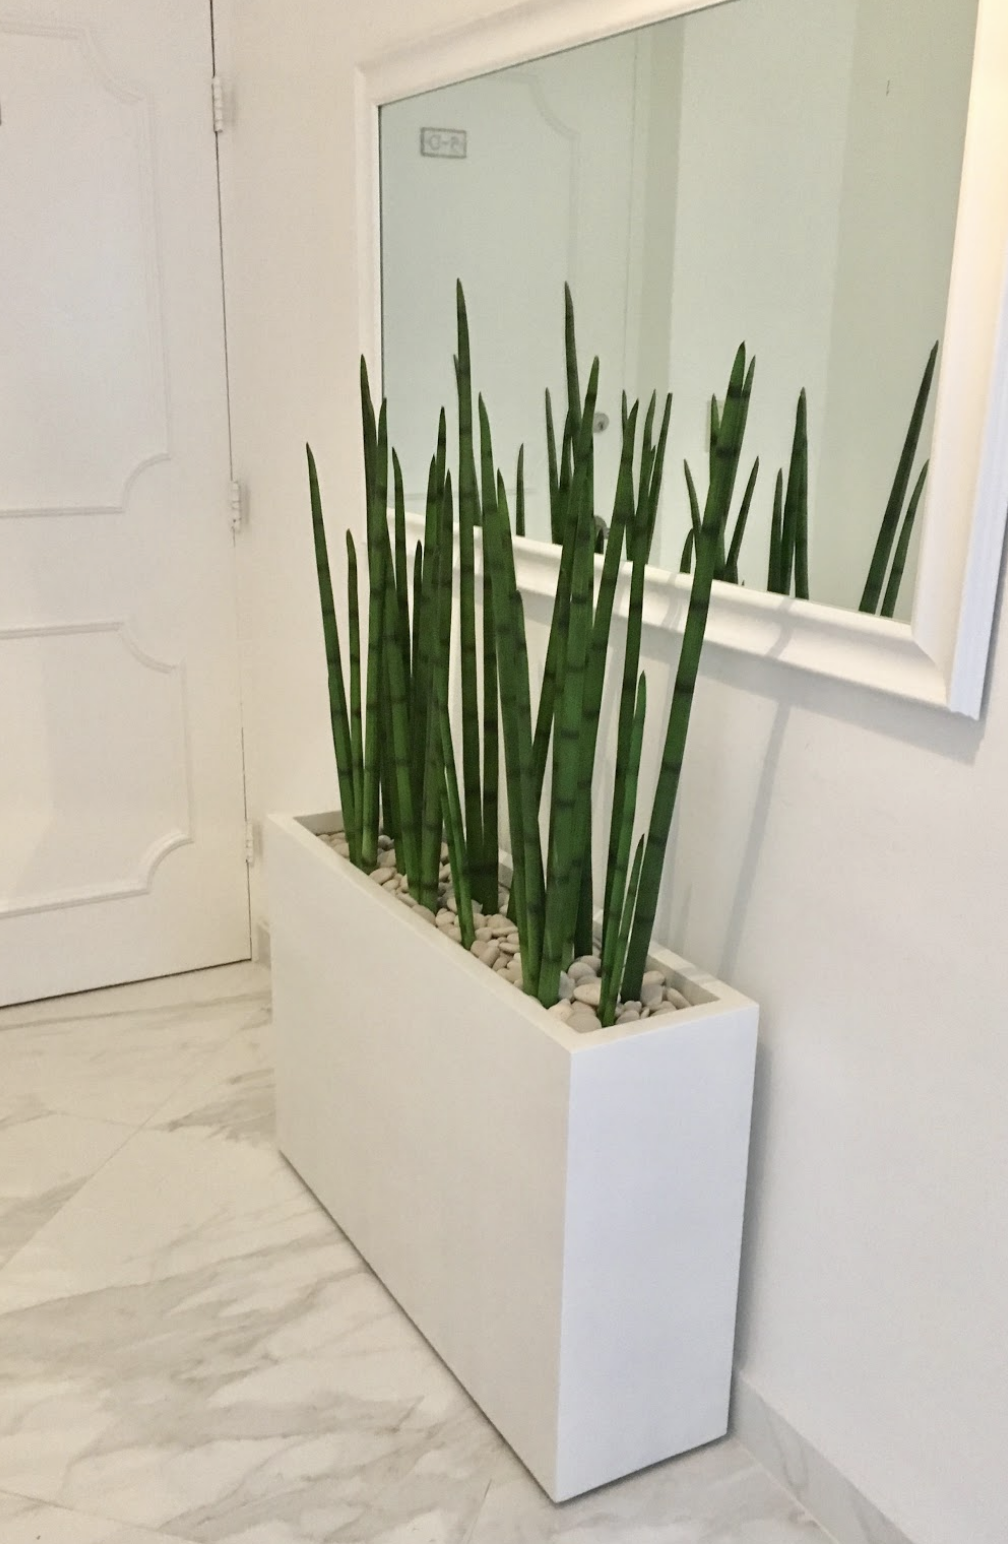 Milano Narrow Rectangular Planter Jay Scotts Collection House Plants Decor Plant Decor Indoor Rectangular Planters